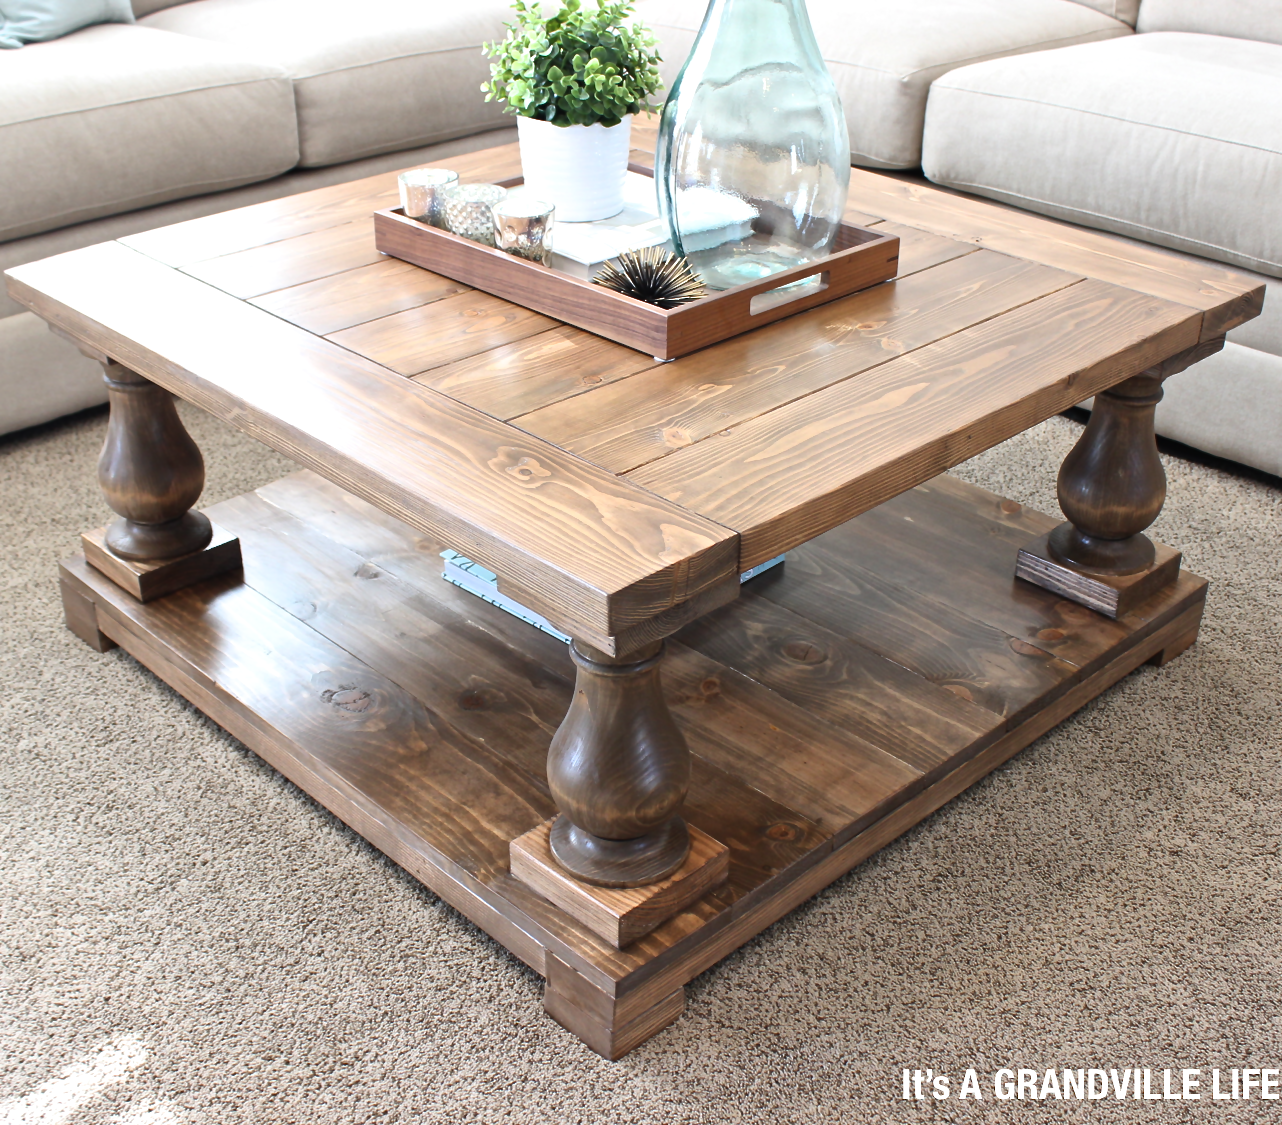 Diy Balustrade Coffee Table Coffee Table Farmhouse Coffee Table Inspiration Coffee Table Plans [ 1125 x 1282 Pixel ]